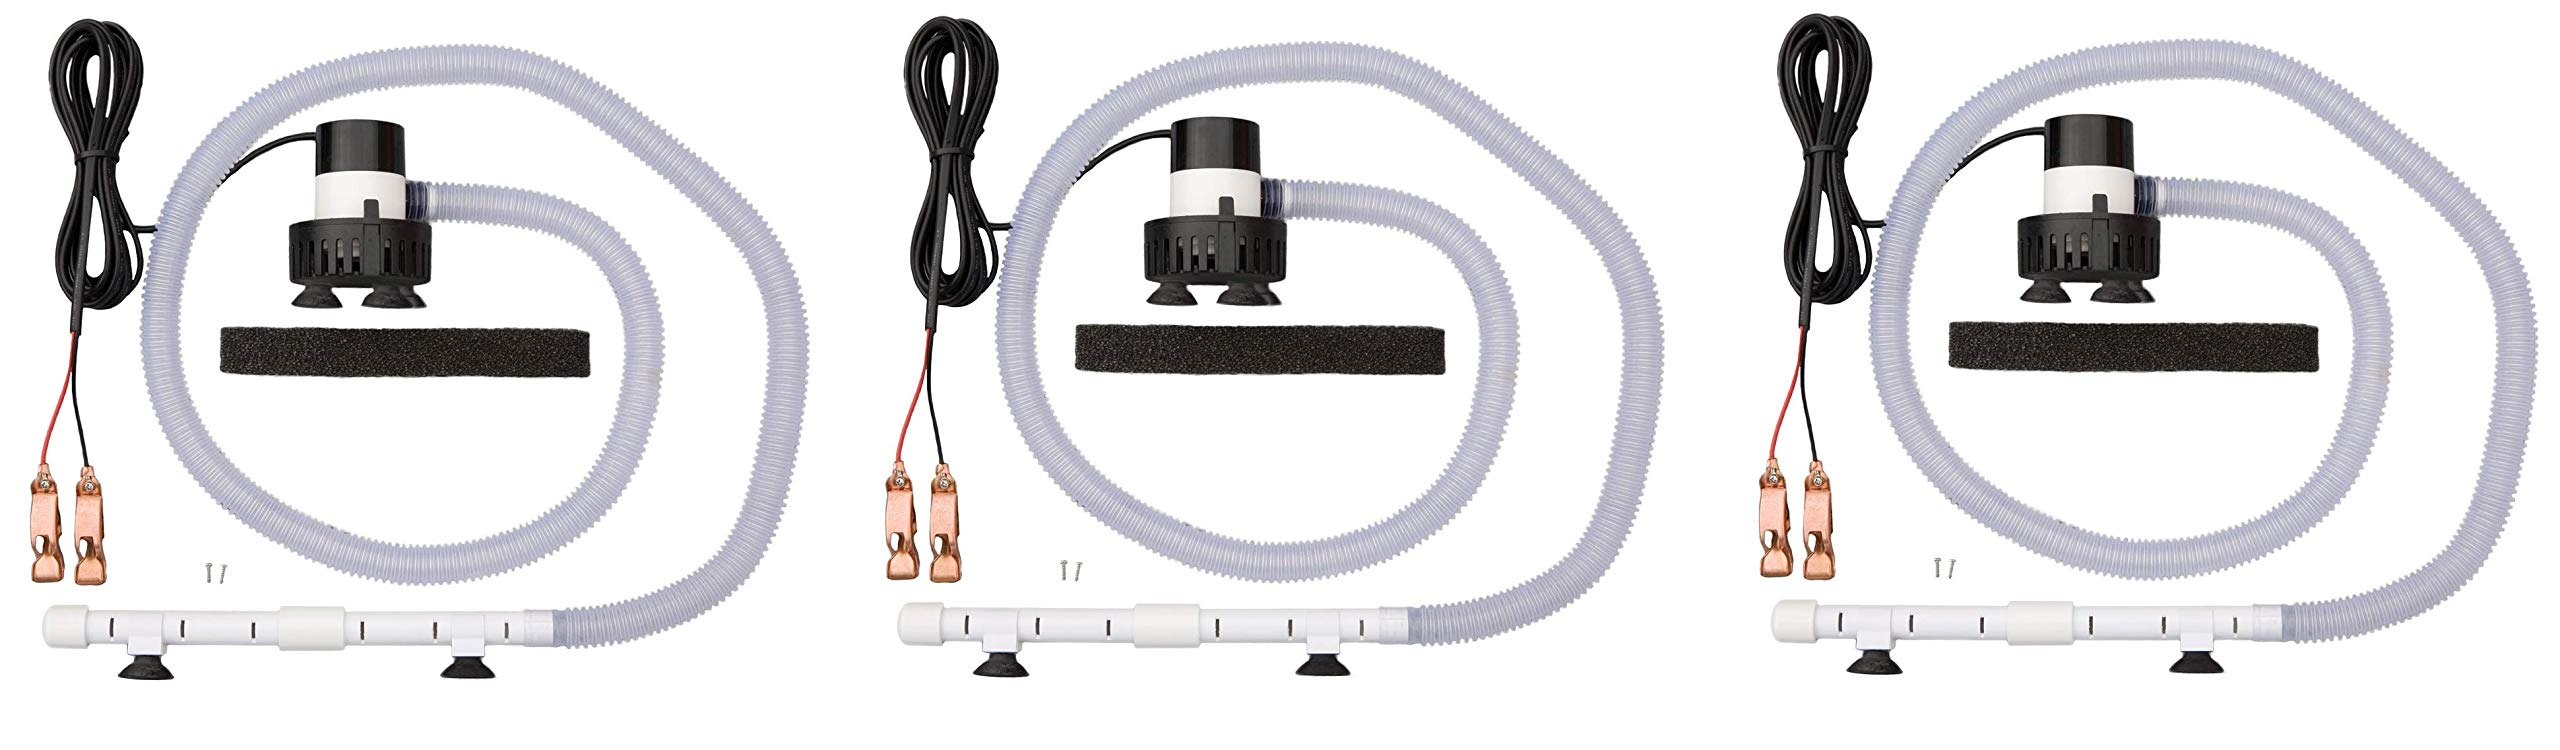 Marine Metal SS212 Aeration System 12 V DC with Bilge Pump & Kit (Thrее Расk) by Marine Metal